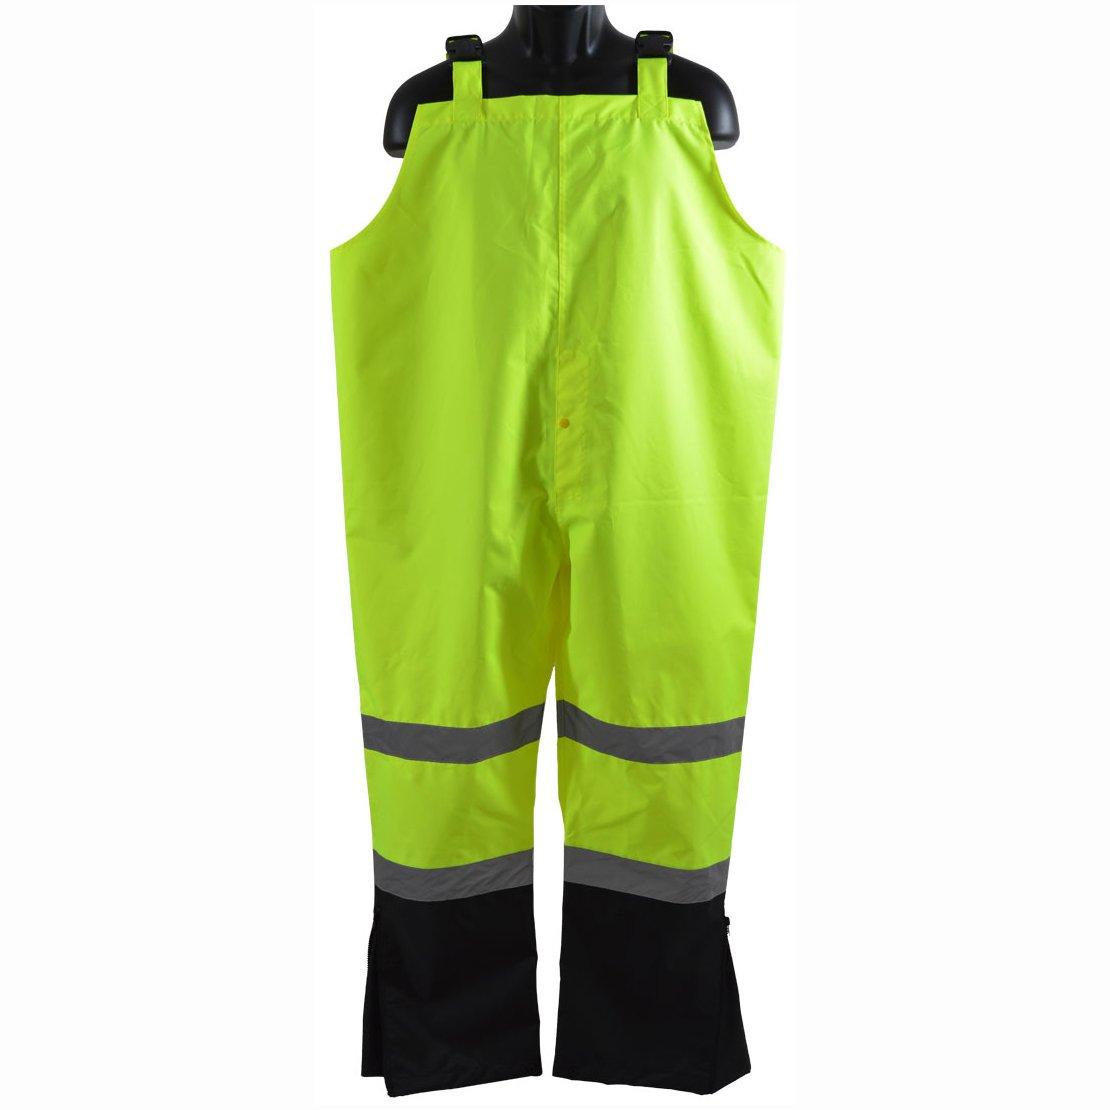 Petra Roc LBBIP-CE-5X Bib Rain Pants ANSI Class E Two Tone Lime/Black 300D Oxford/PU Coating Waterproof, 5X